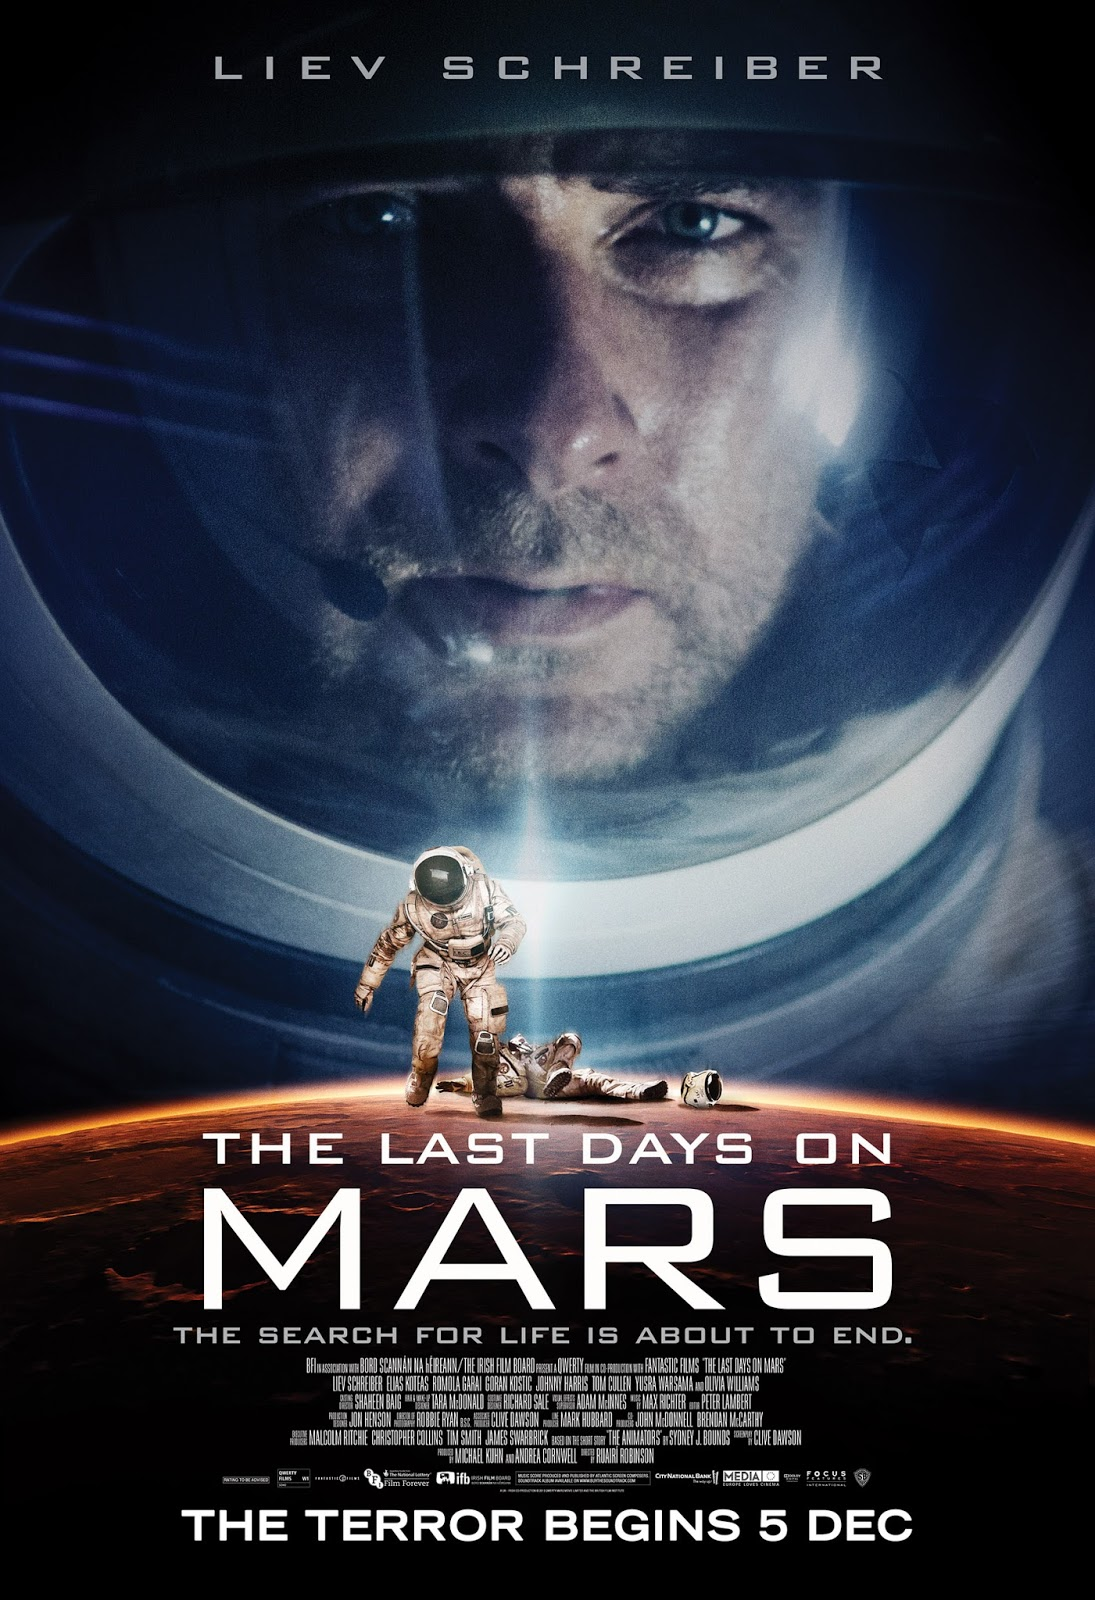 The Last Days on Mars (2013) ταινιες online seires oipeirates greek subs